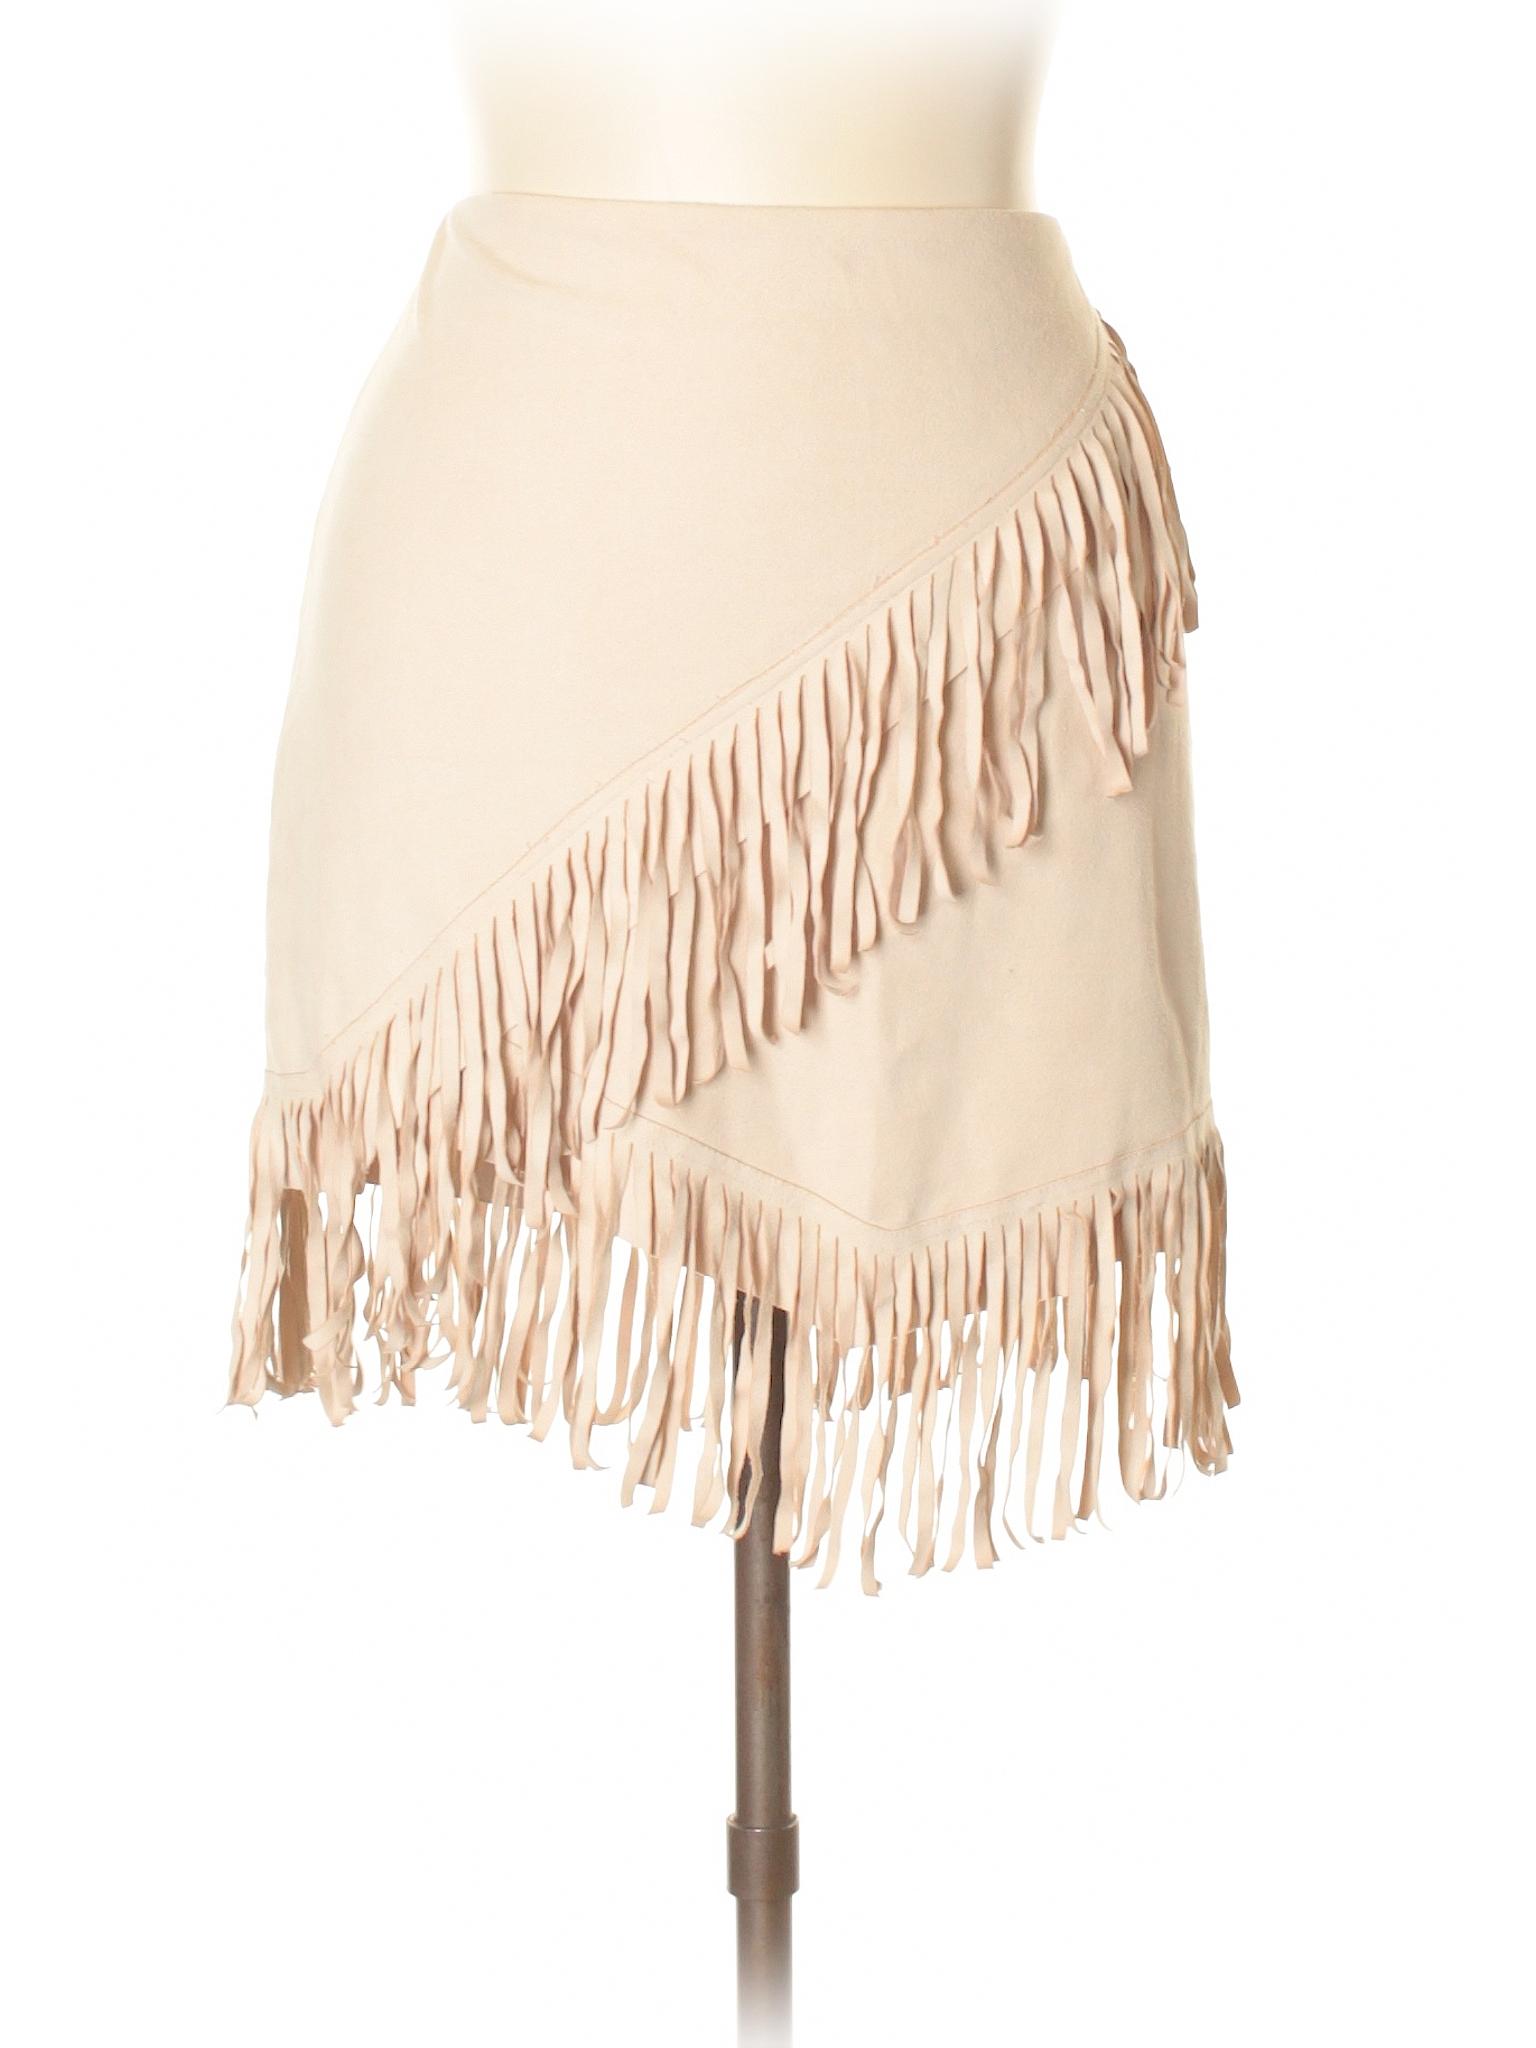 Skirt Boutique Skirt Casual Boutique Skirt Casual Boutique Boutique Casual Casual Skirt qXwFt5